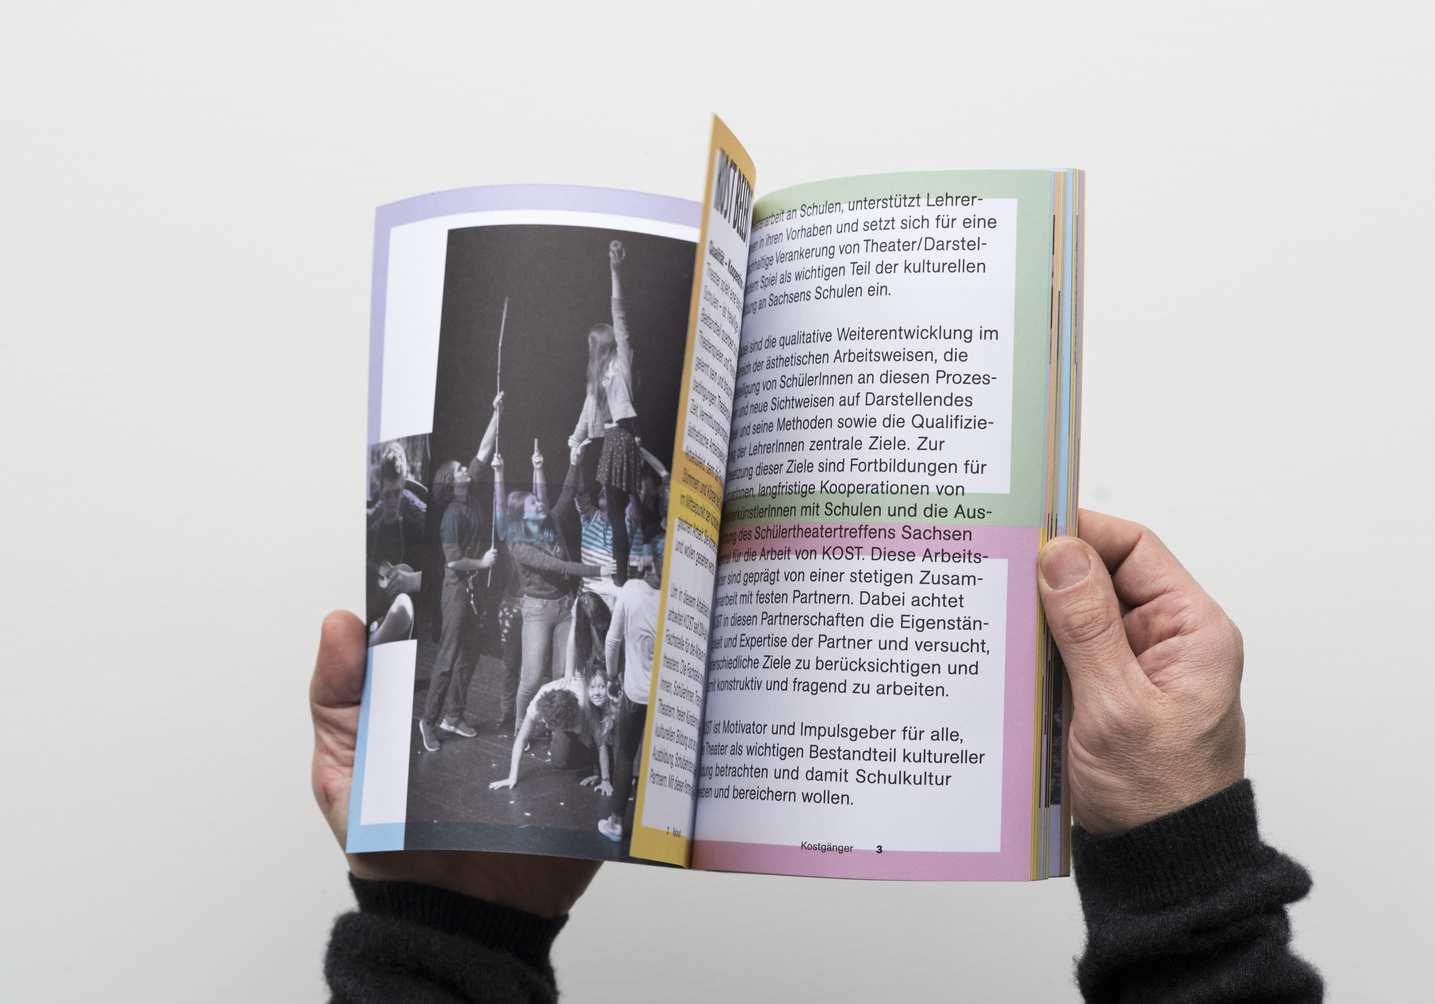 kost-brochure-2-1435x1004px